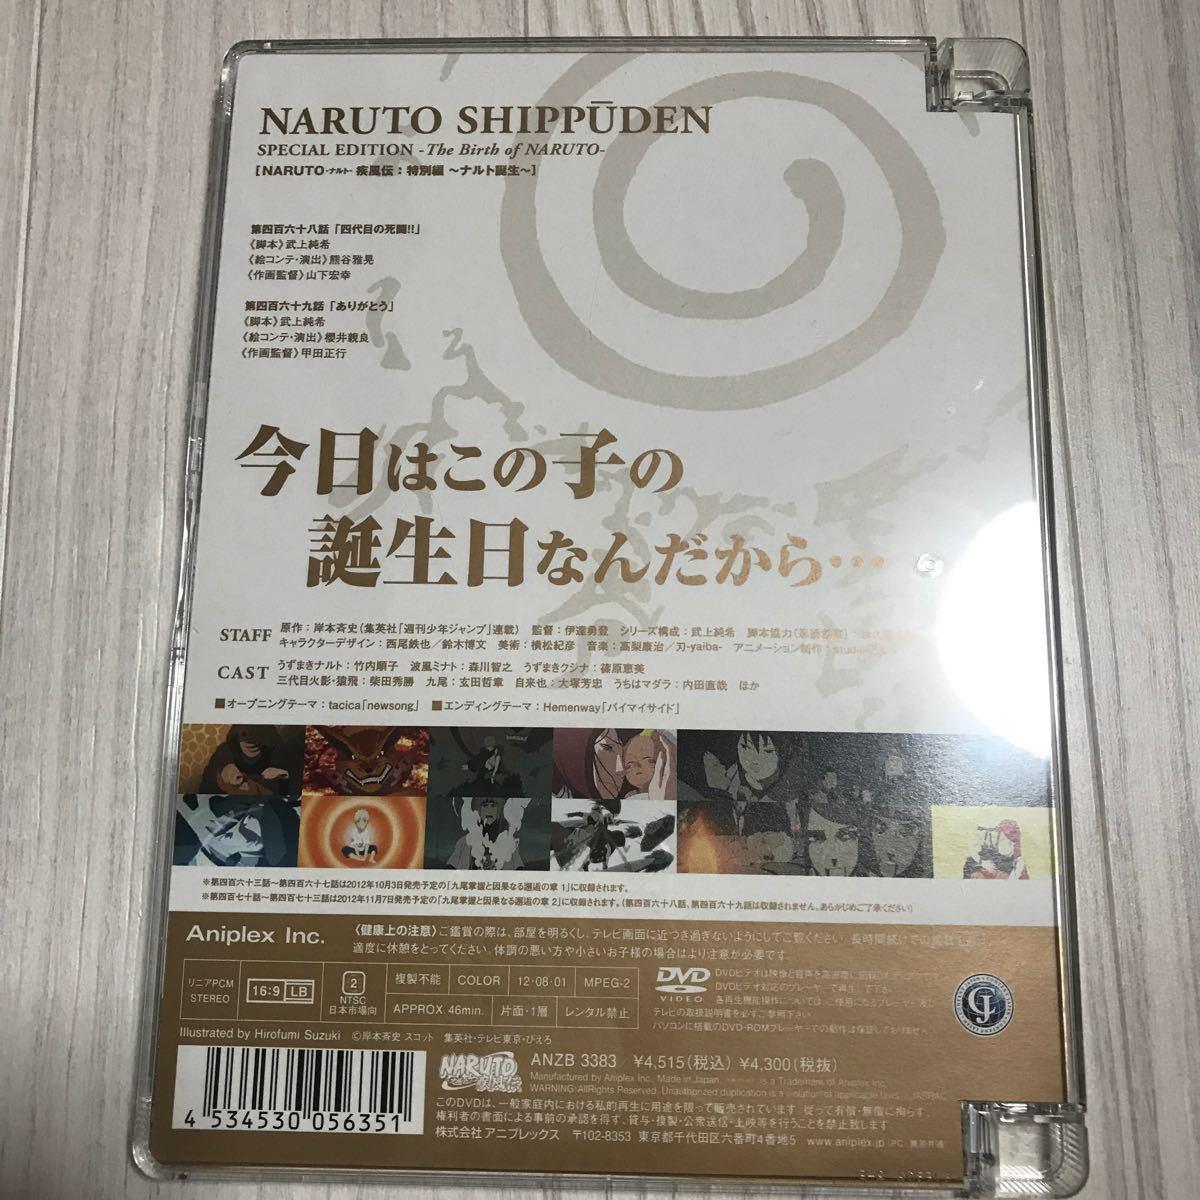 NARUTO-ナルト- 疾風伝 特別編 〜ナルト誕生〜(完全生産限定版)/DVD/ANZB-3383 中古